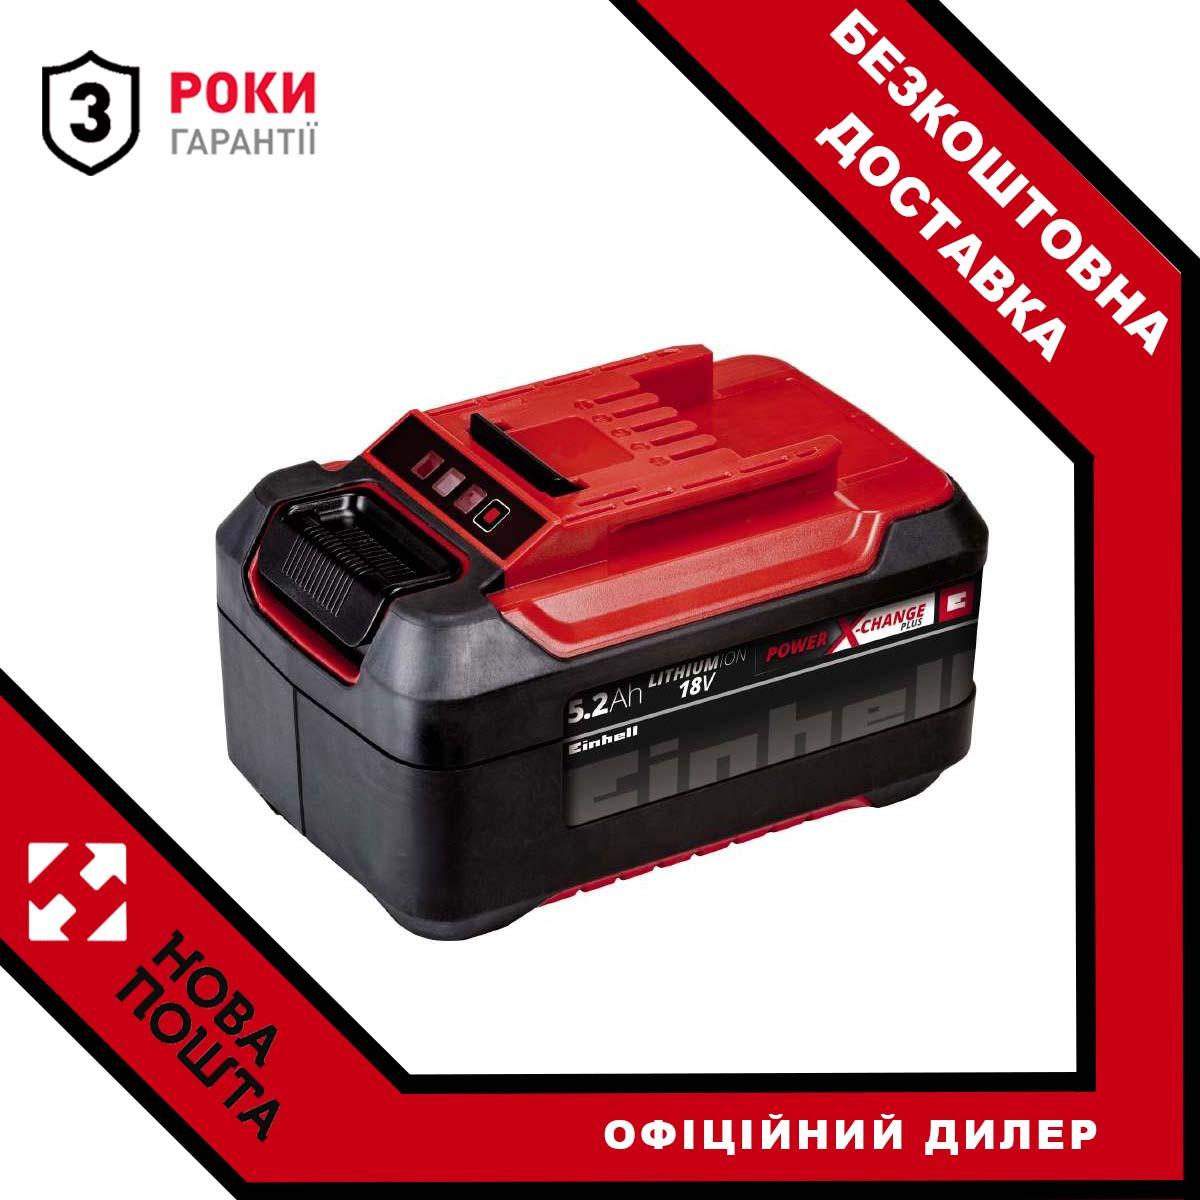 Акумулятор Einhell Power-X-Change Plus 18V 5,2 Ah (4511437)